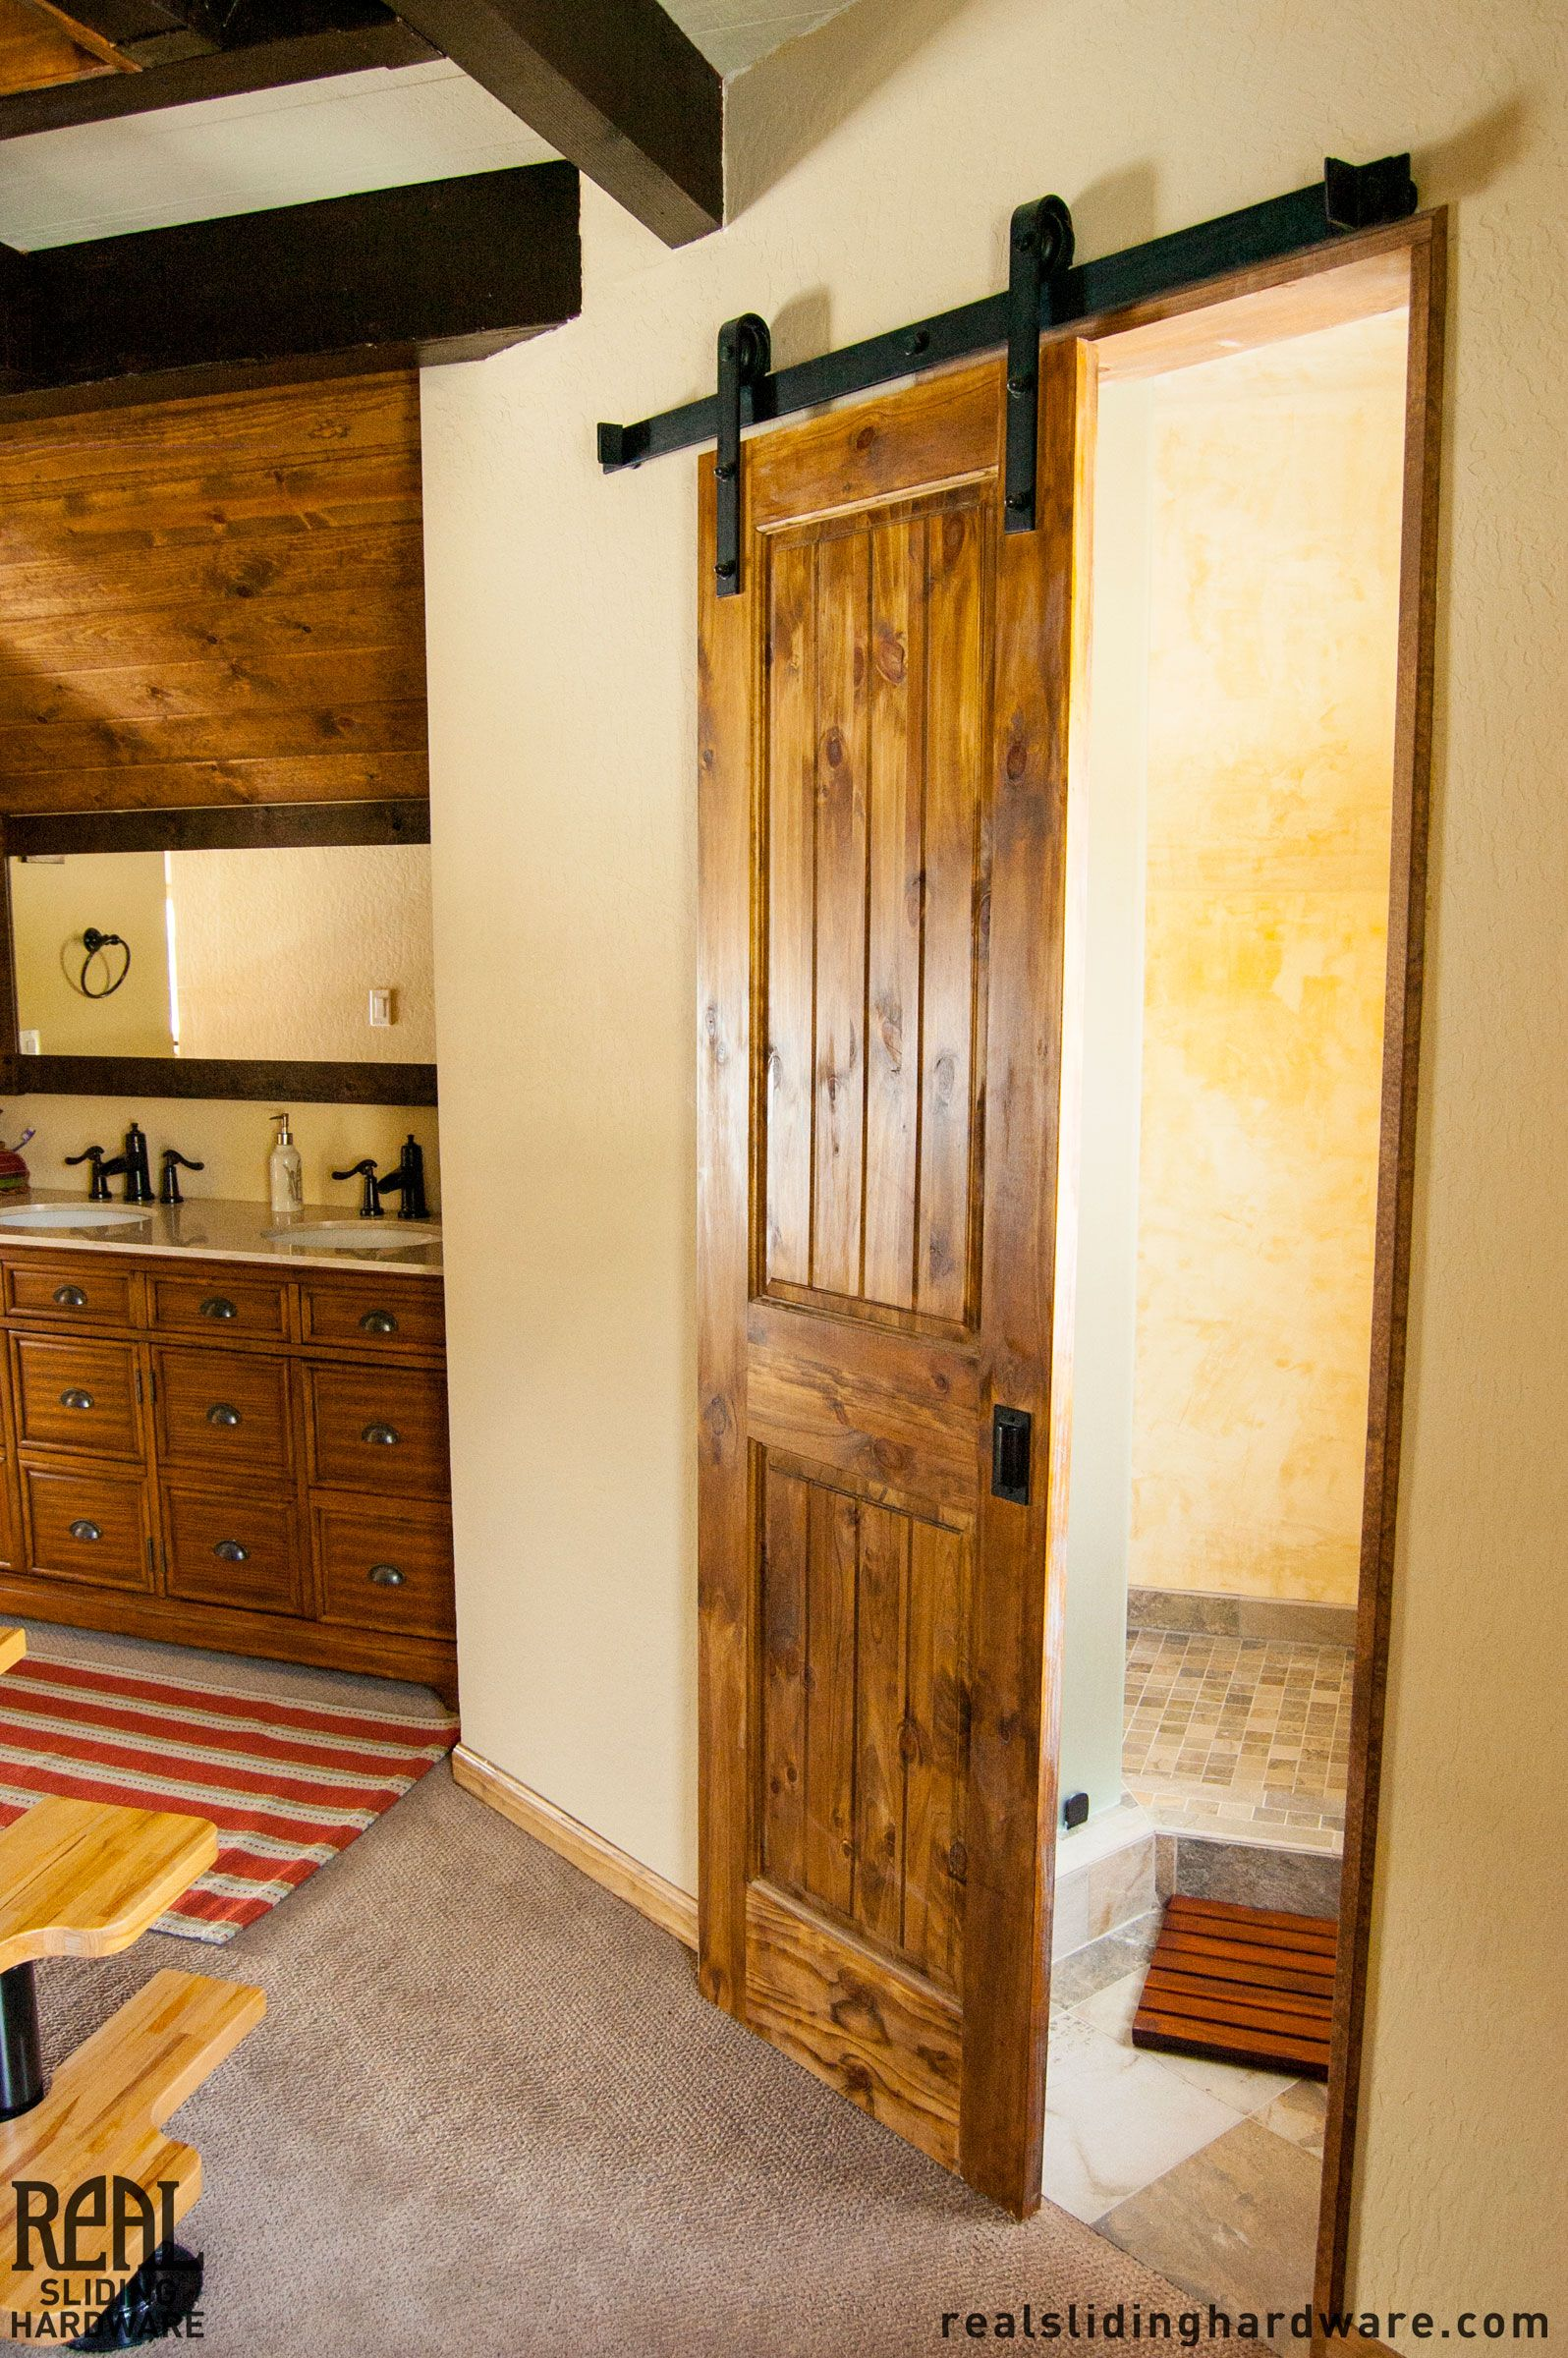 A Teeny Tiny Bathroom Uses Barn Door Hardware To Economize Space